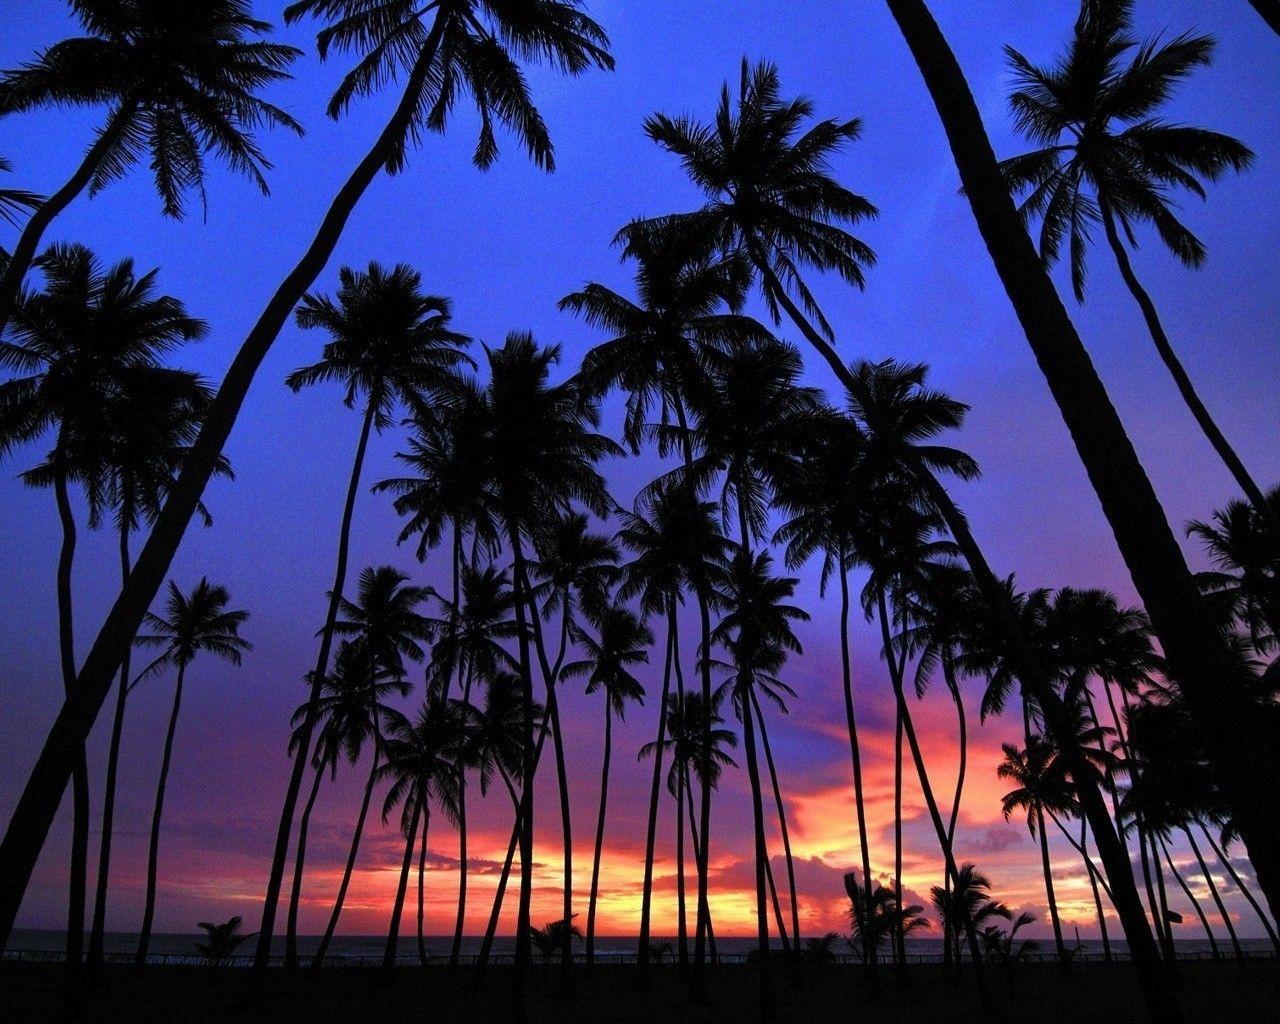 Sri Lanka Landscapes Nature Palm Trees Silhouettes 1280x1024